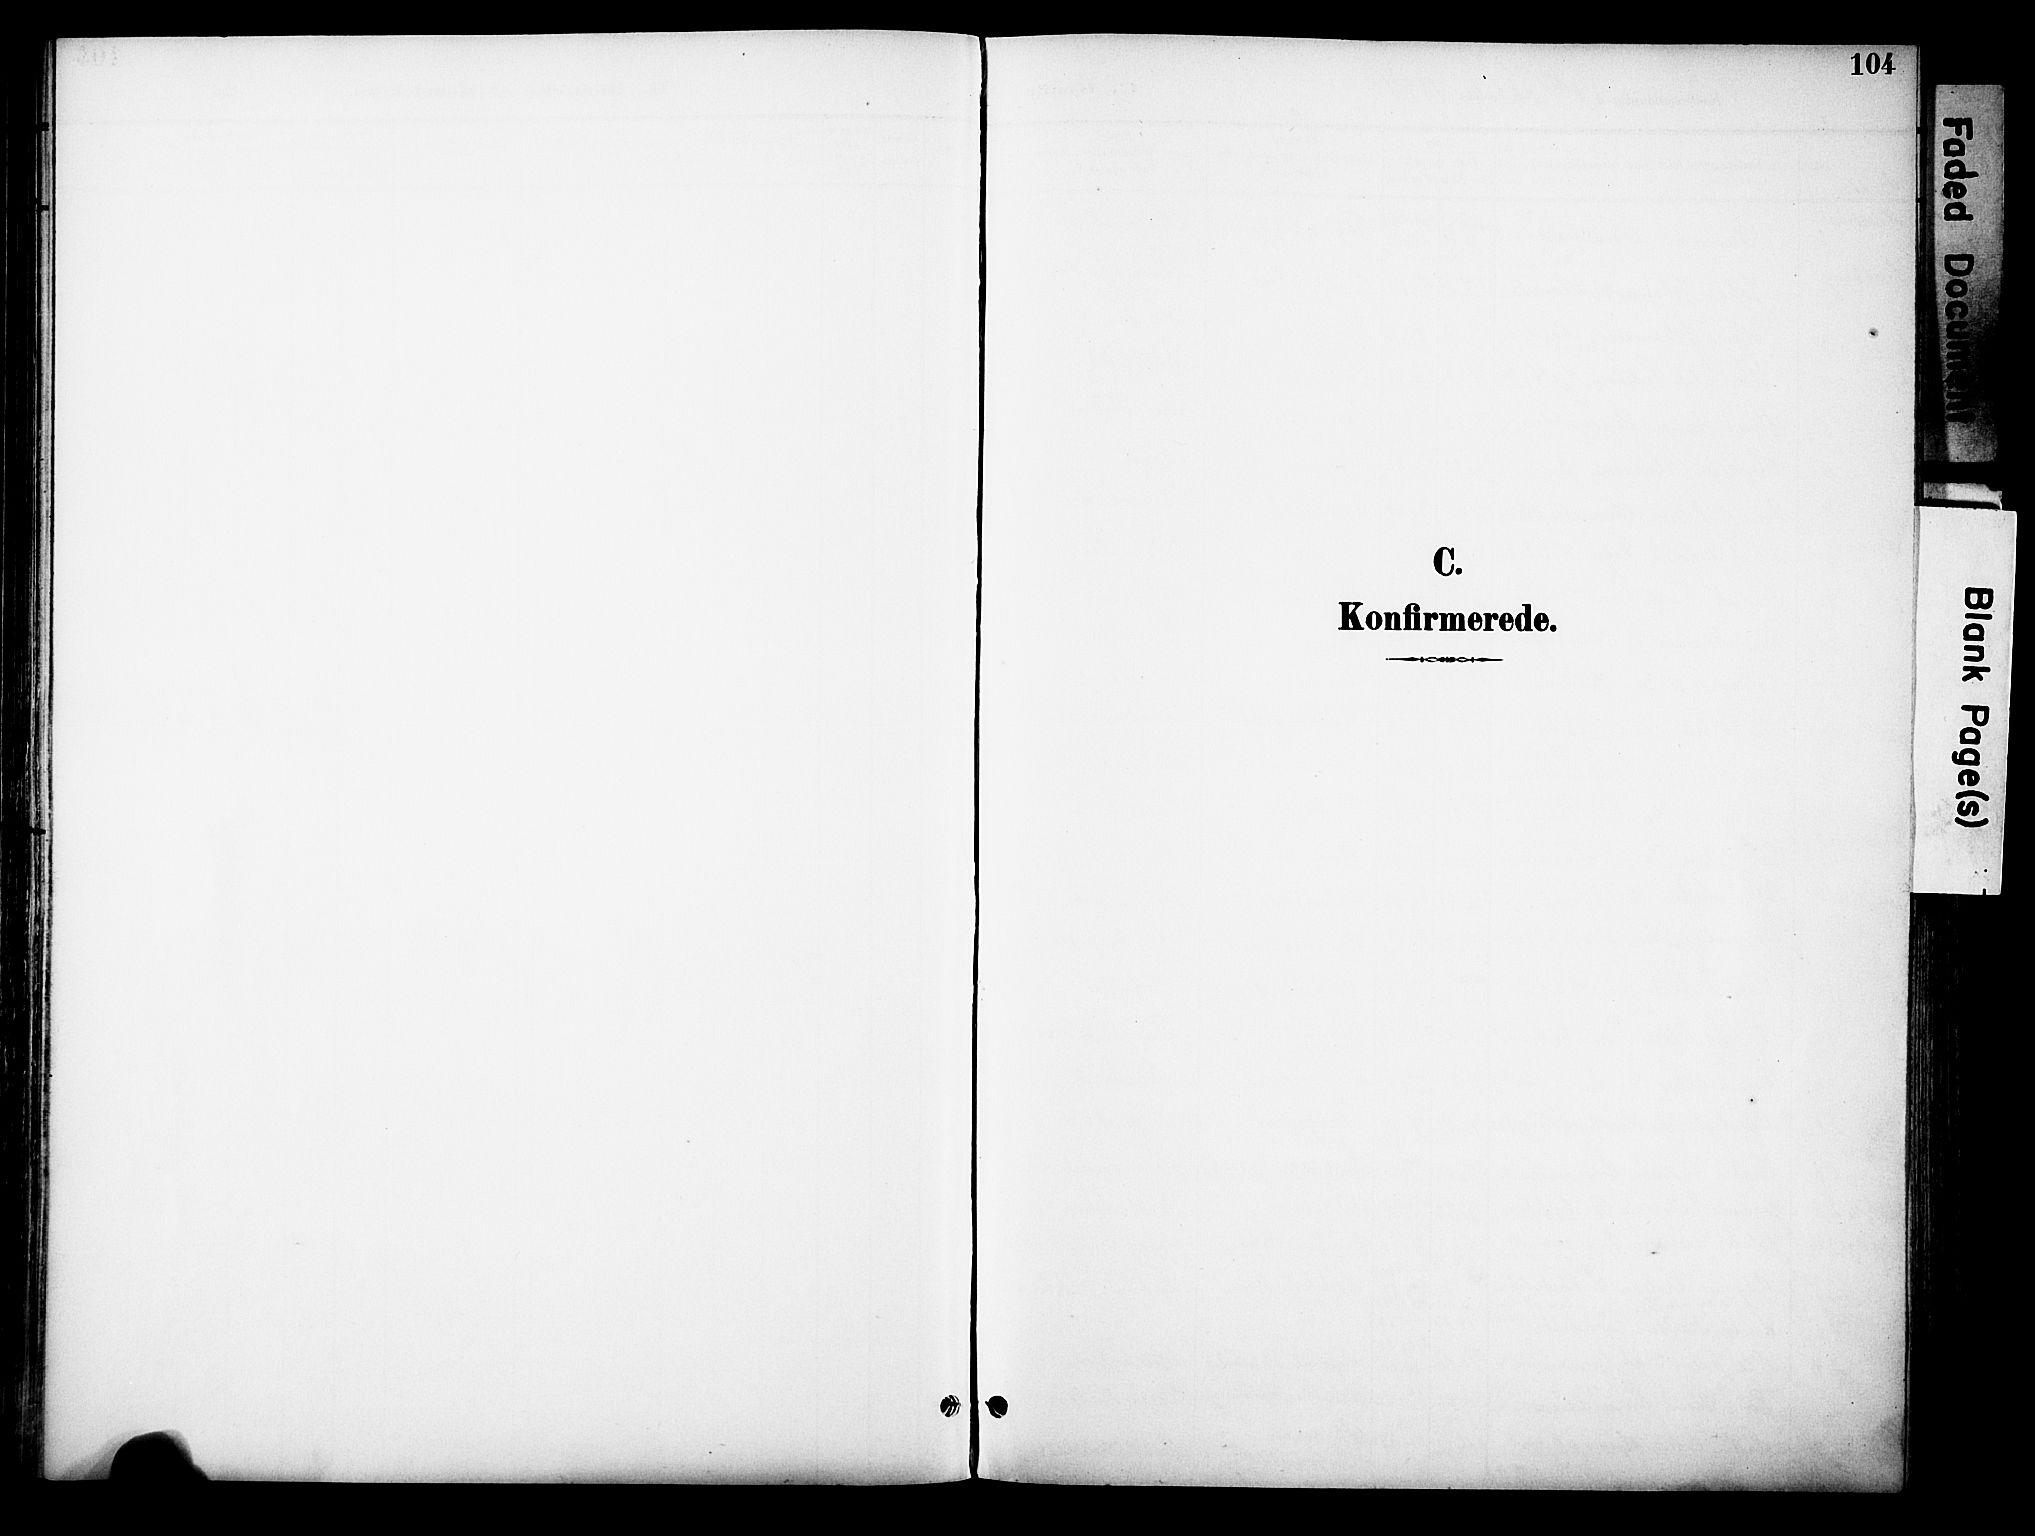 SAH, Østre Toten prestekontor, Ministerialbok nr. 9, 1897-1913, s. 104